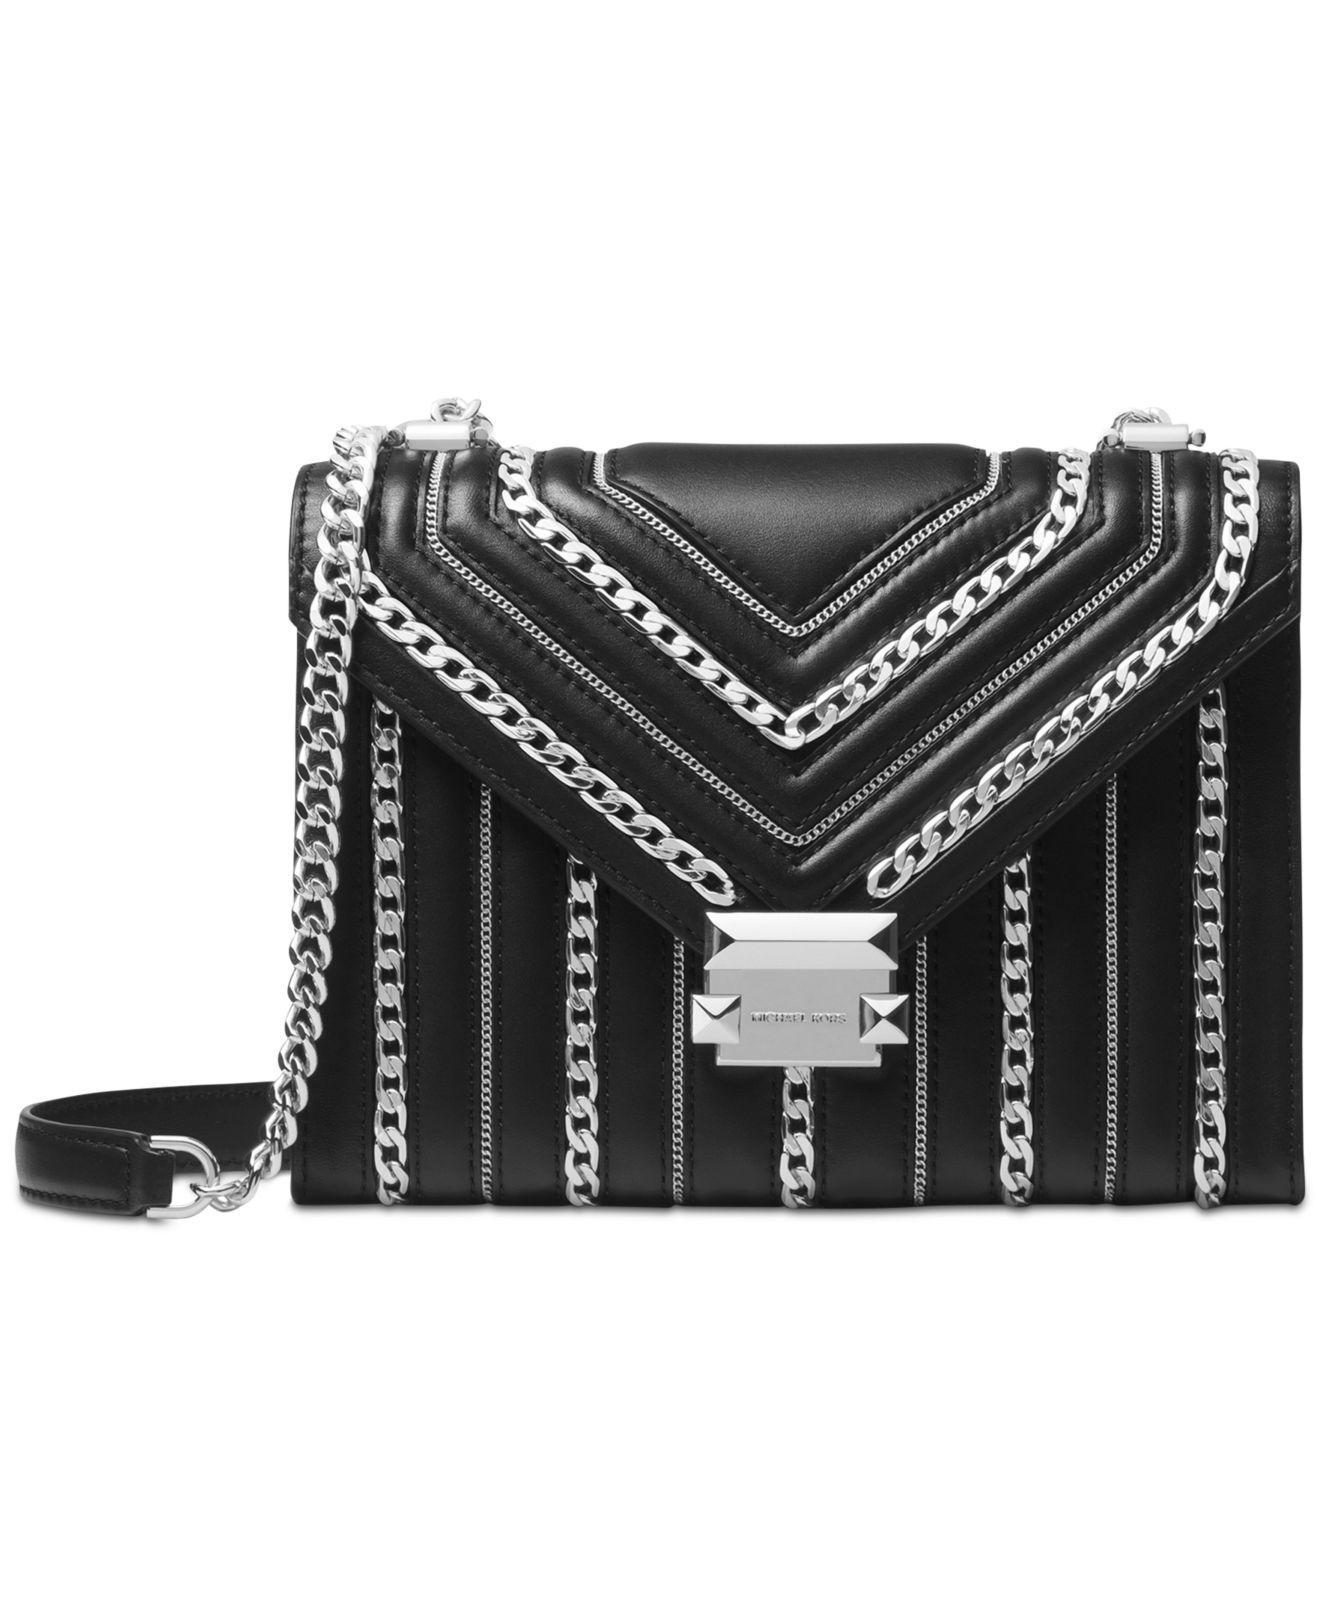 e9d35a52029d3 Michael Kors. Women s Black Michael Whitney Limited Edition Chain Inlay Shoulder  Bag